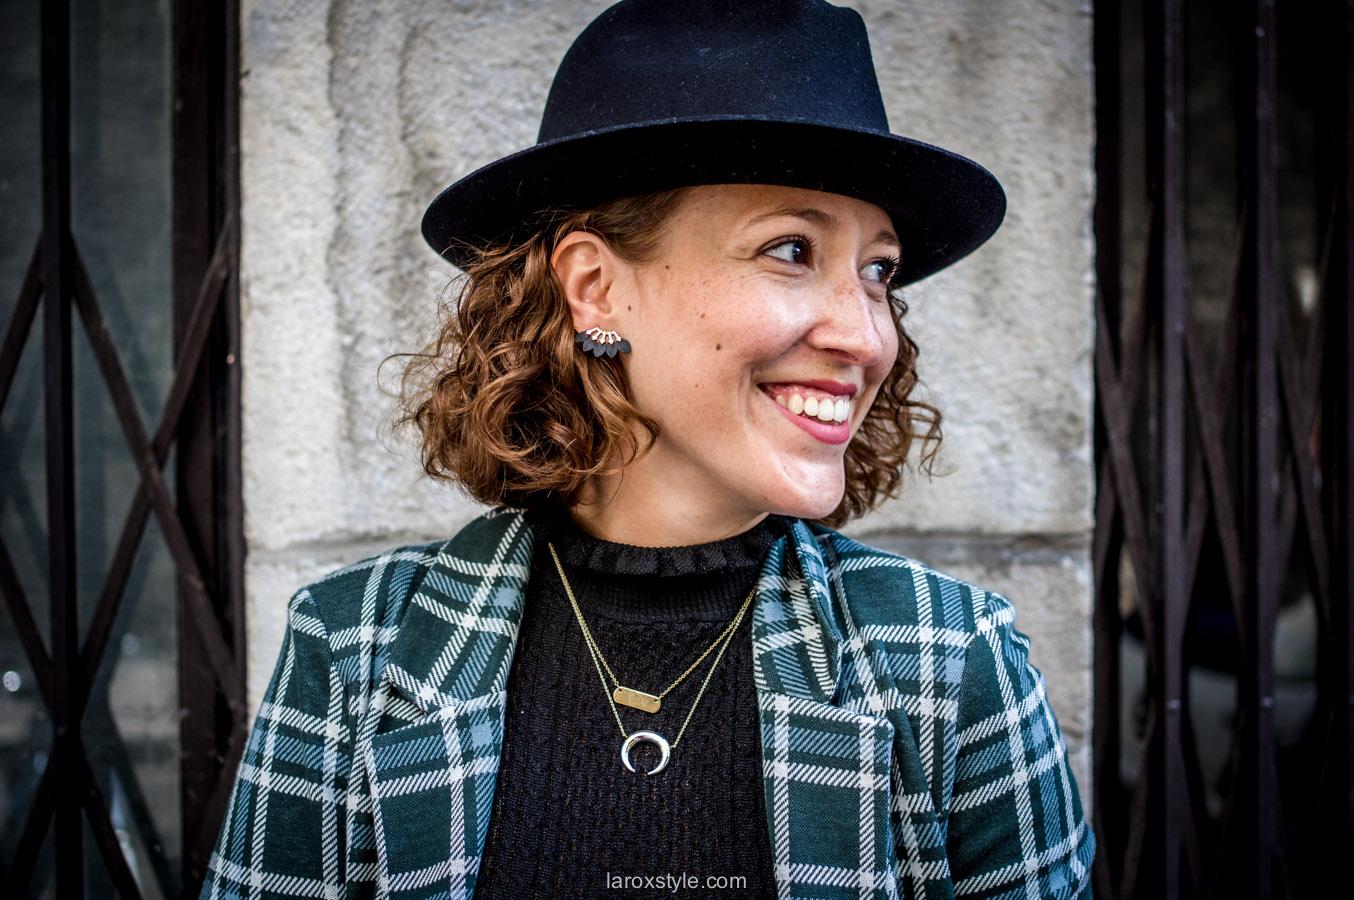 bristish style - veste a carreaux - look jean troue - laroxstyle - blog mode lyon